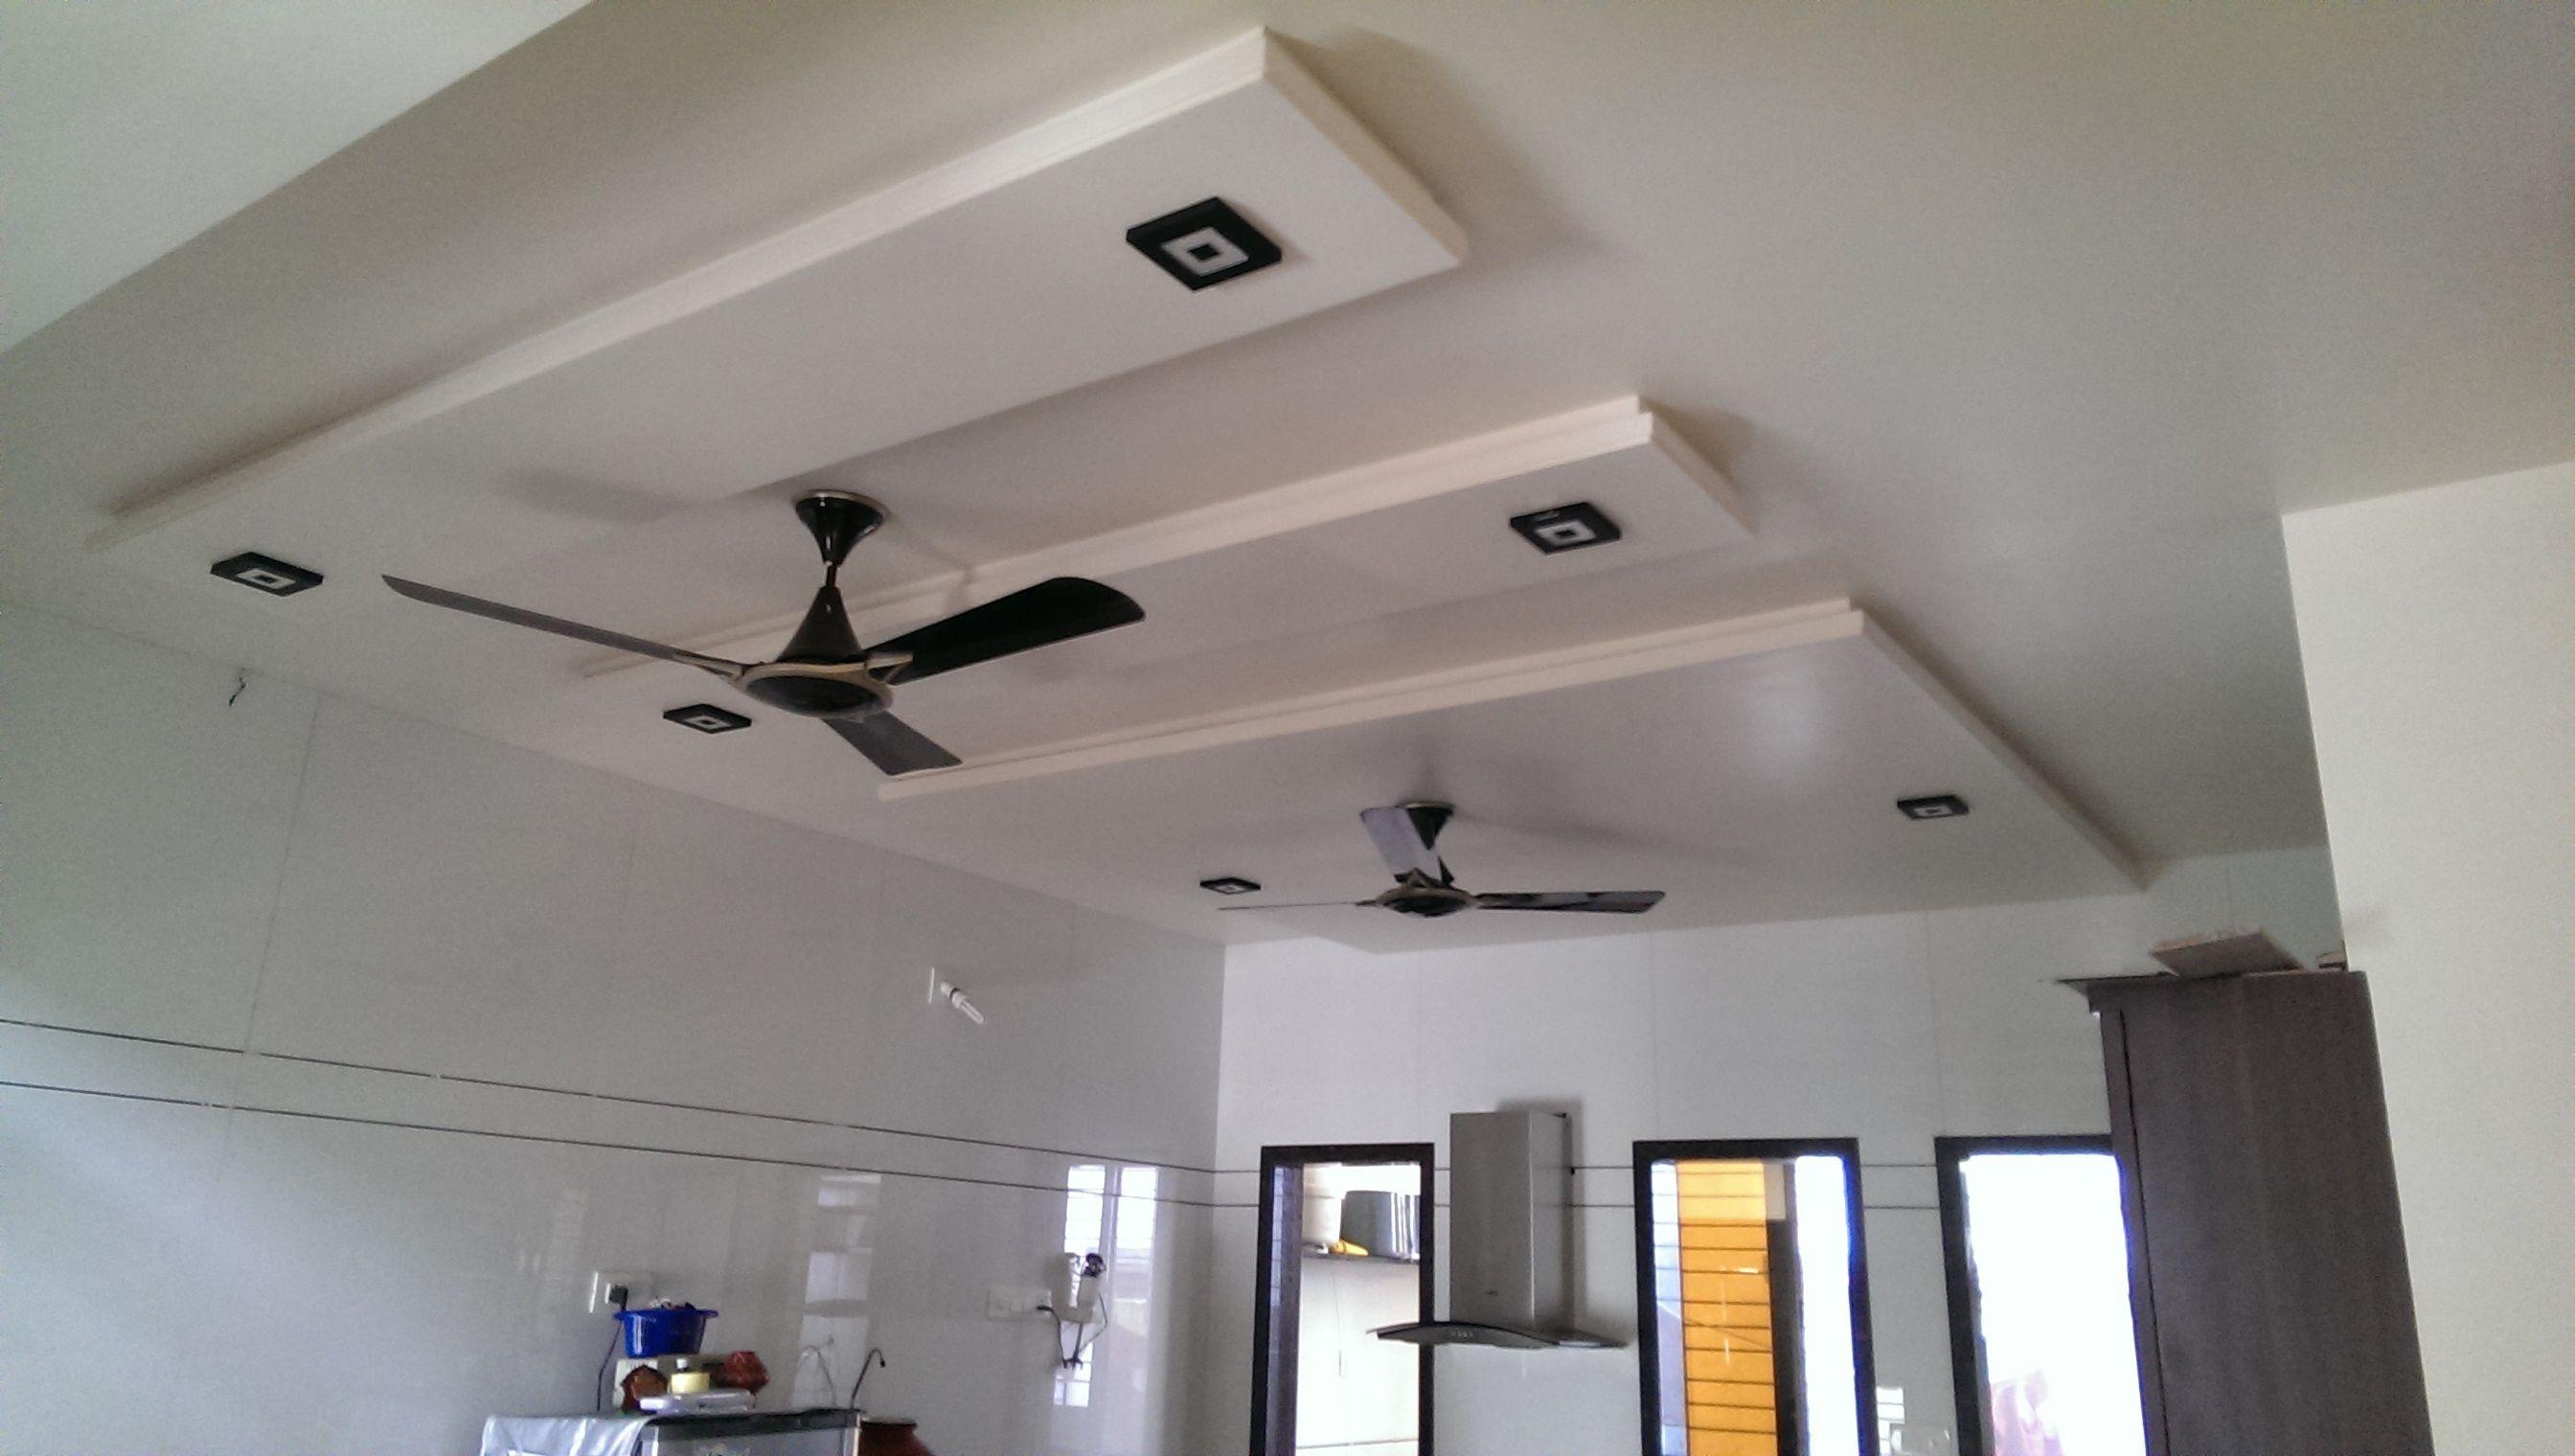 Badezimmerdesign bangladesch staggering unique ideas false ceiling ideas fabrics plain false